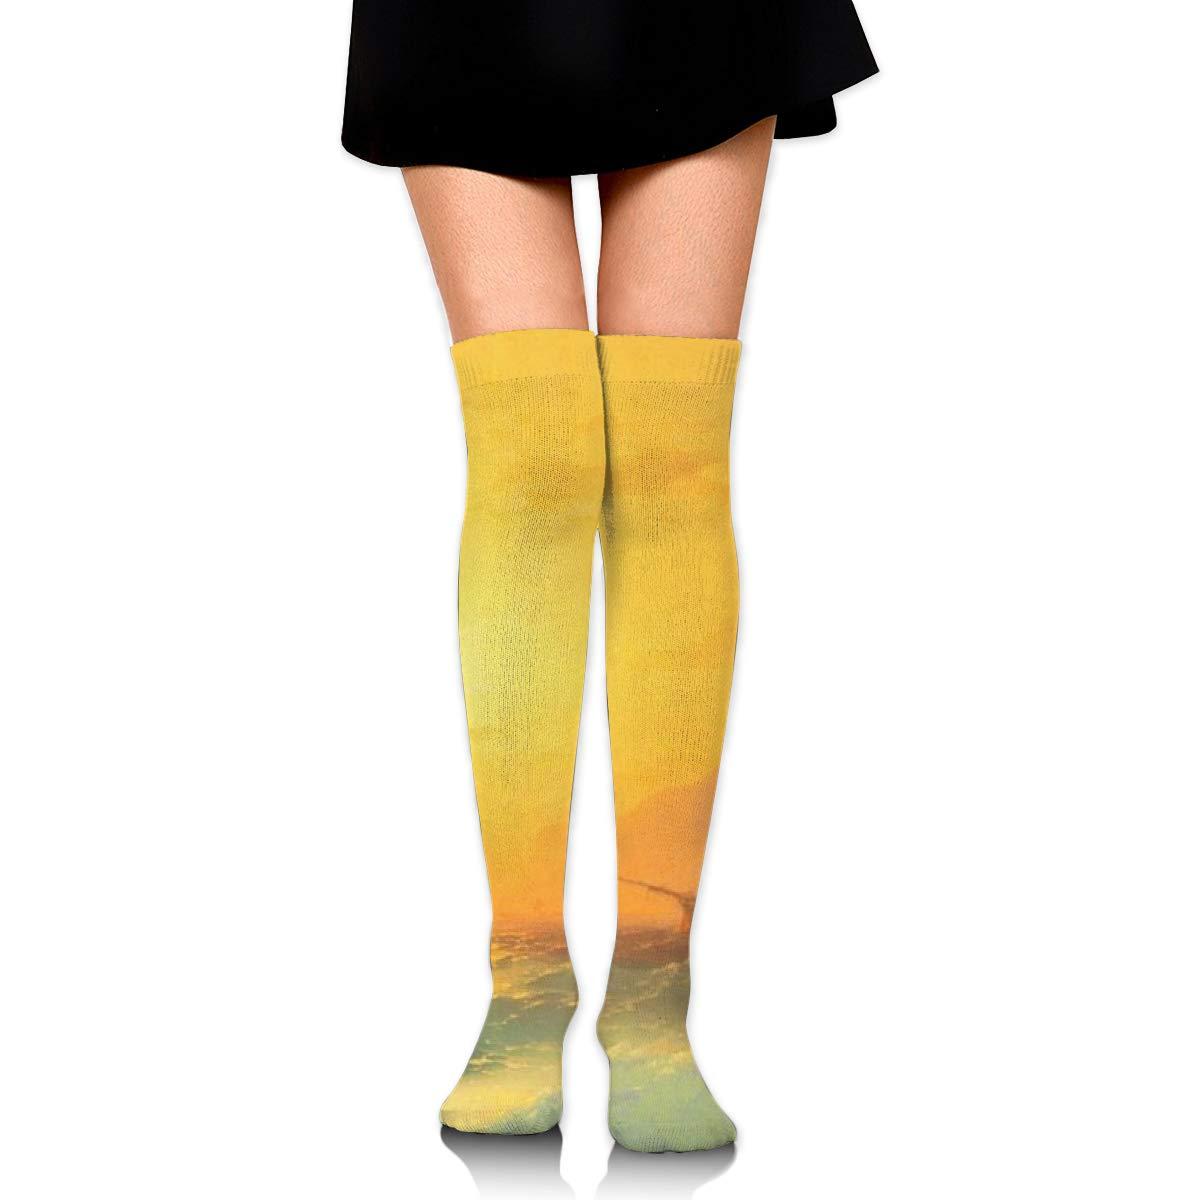 Women Crew Socks Thigh High Knee Ancient Ship Long Tube Dress Legging Soccer Compression Stocking